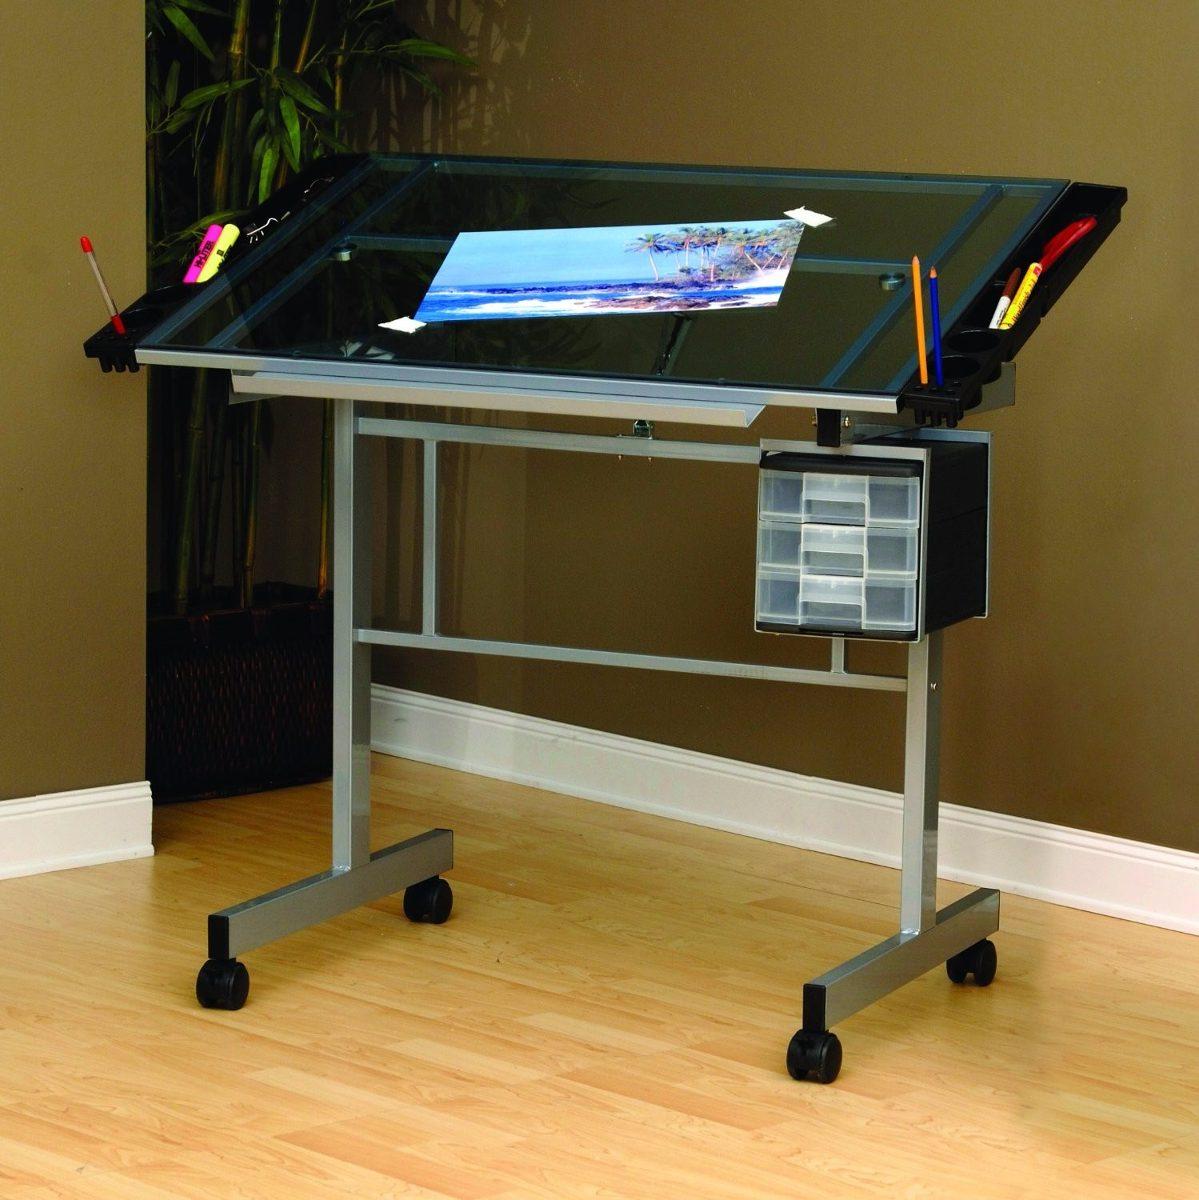 Restirador arquitecto tabla mesa trabajo dibujo escritorio for Escritorio arquitecto